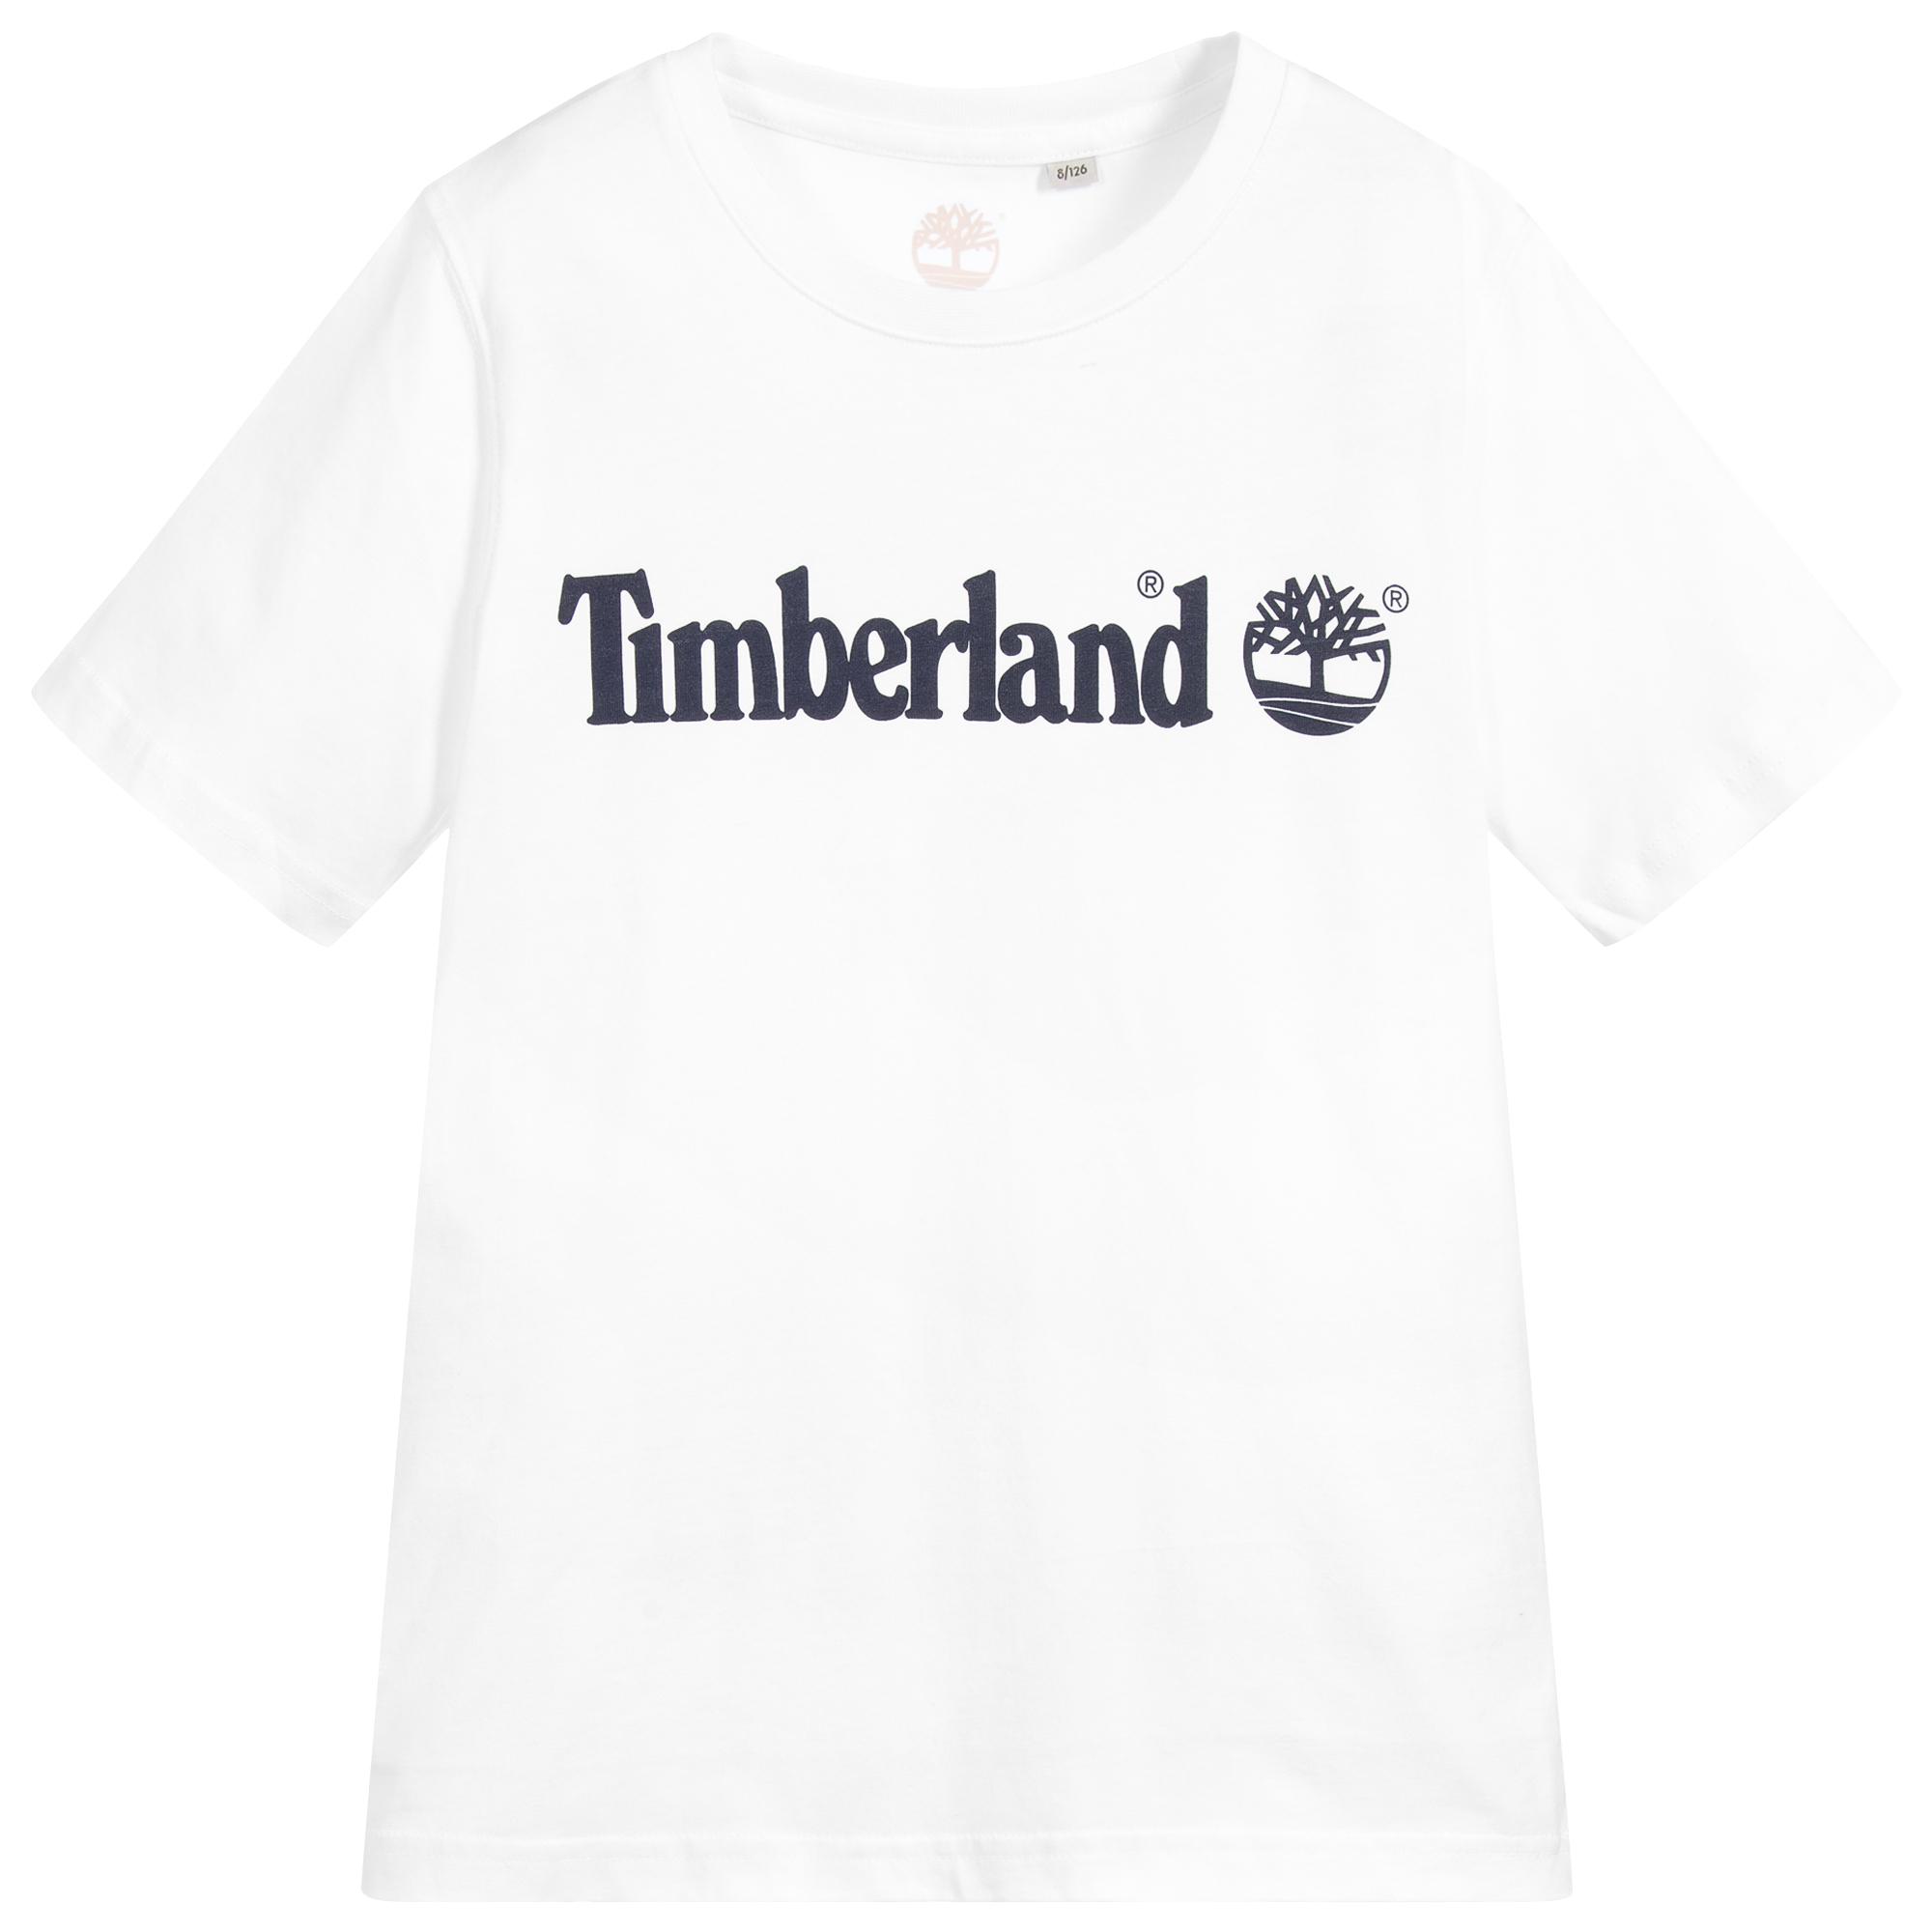 Electricista Ánimo eje  Timberland - White Organic Cotton T-Shirt | Childrensalon